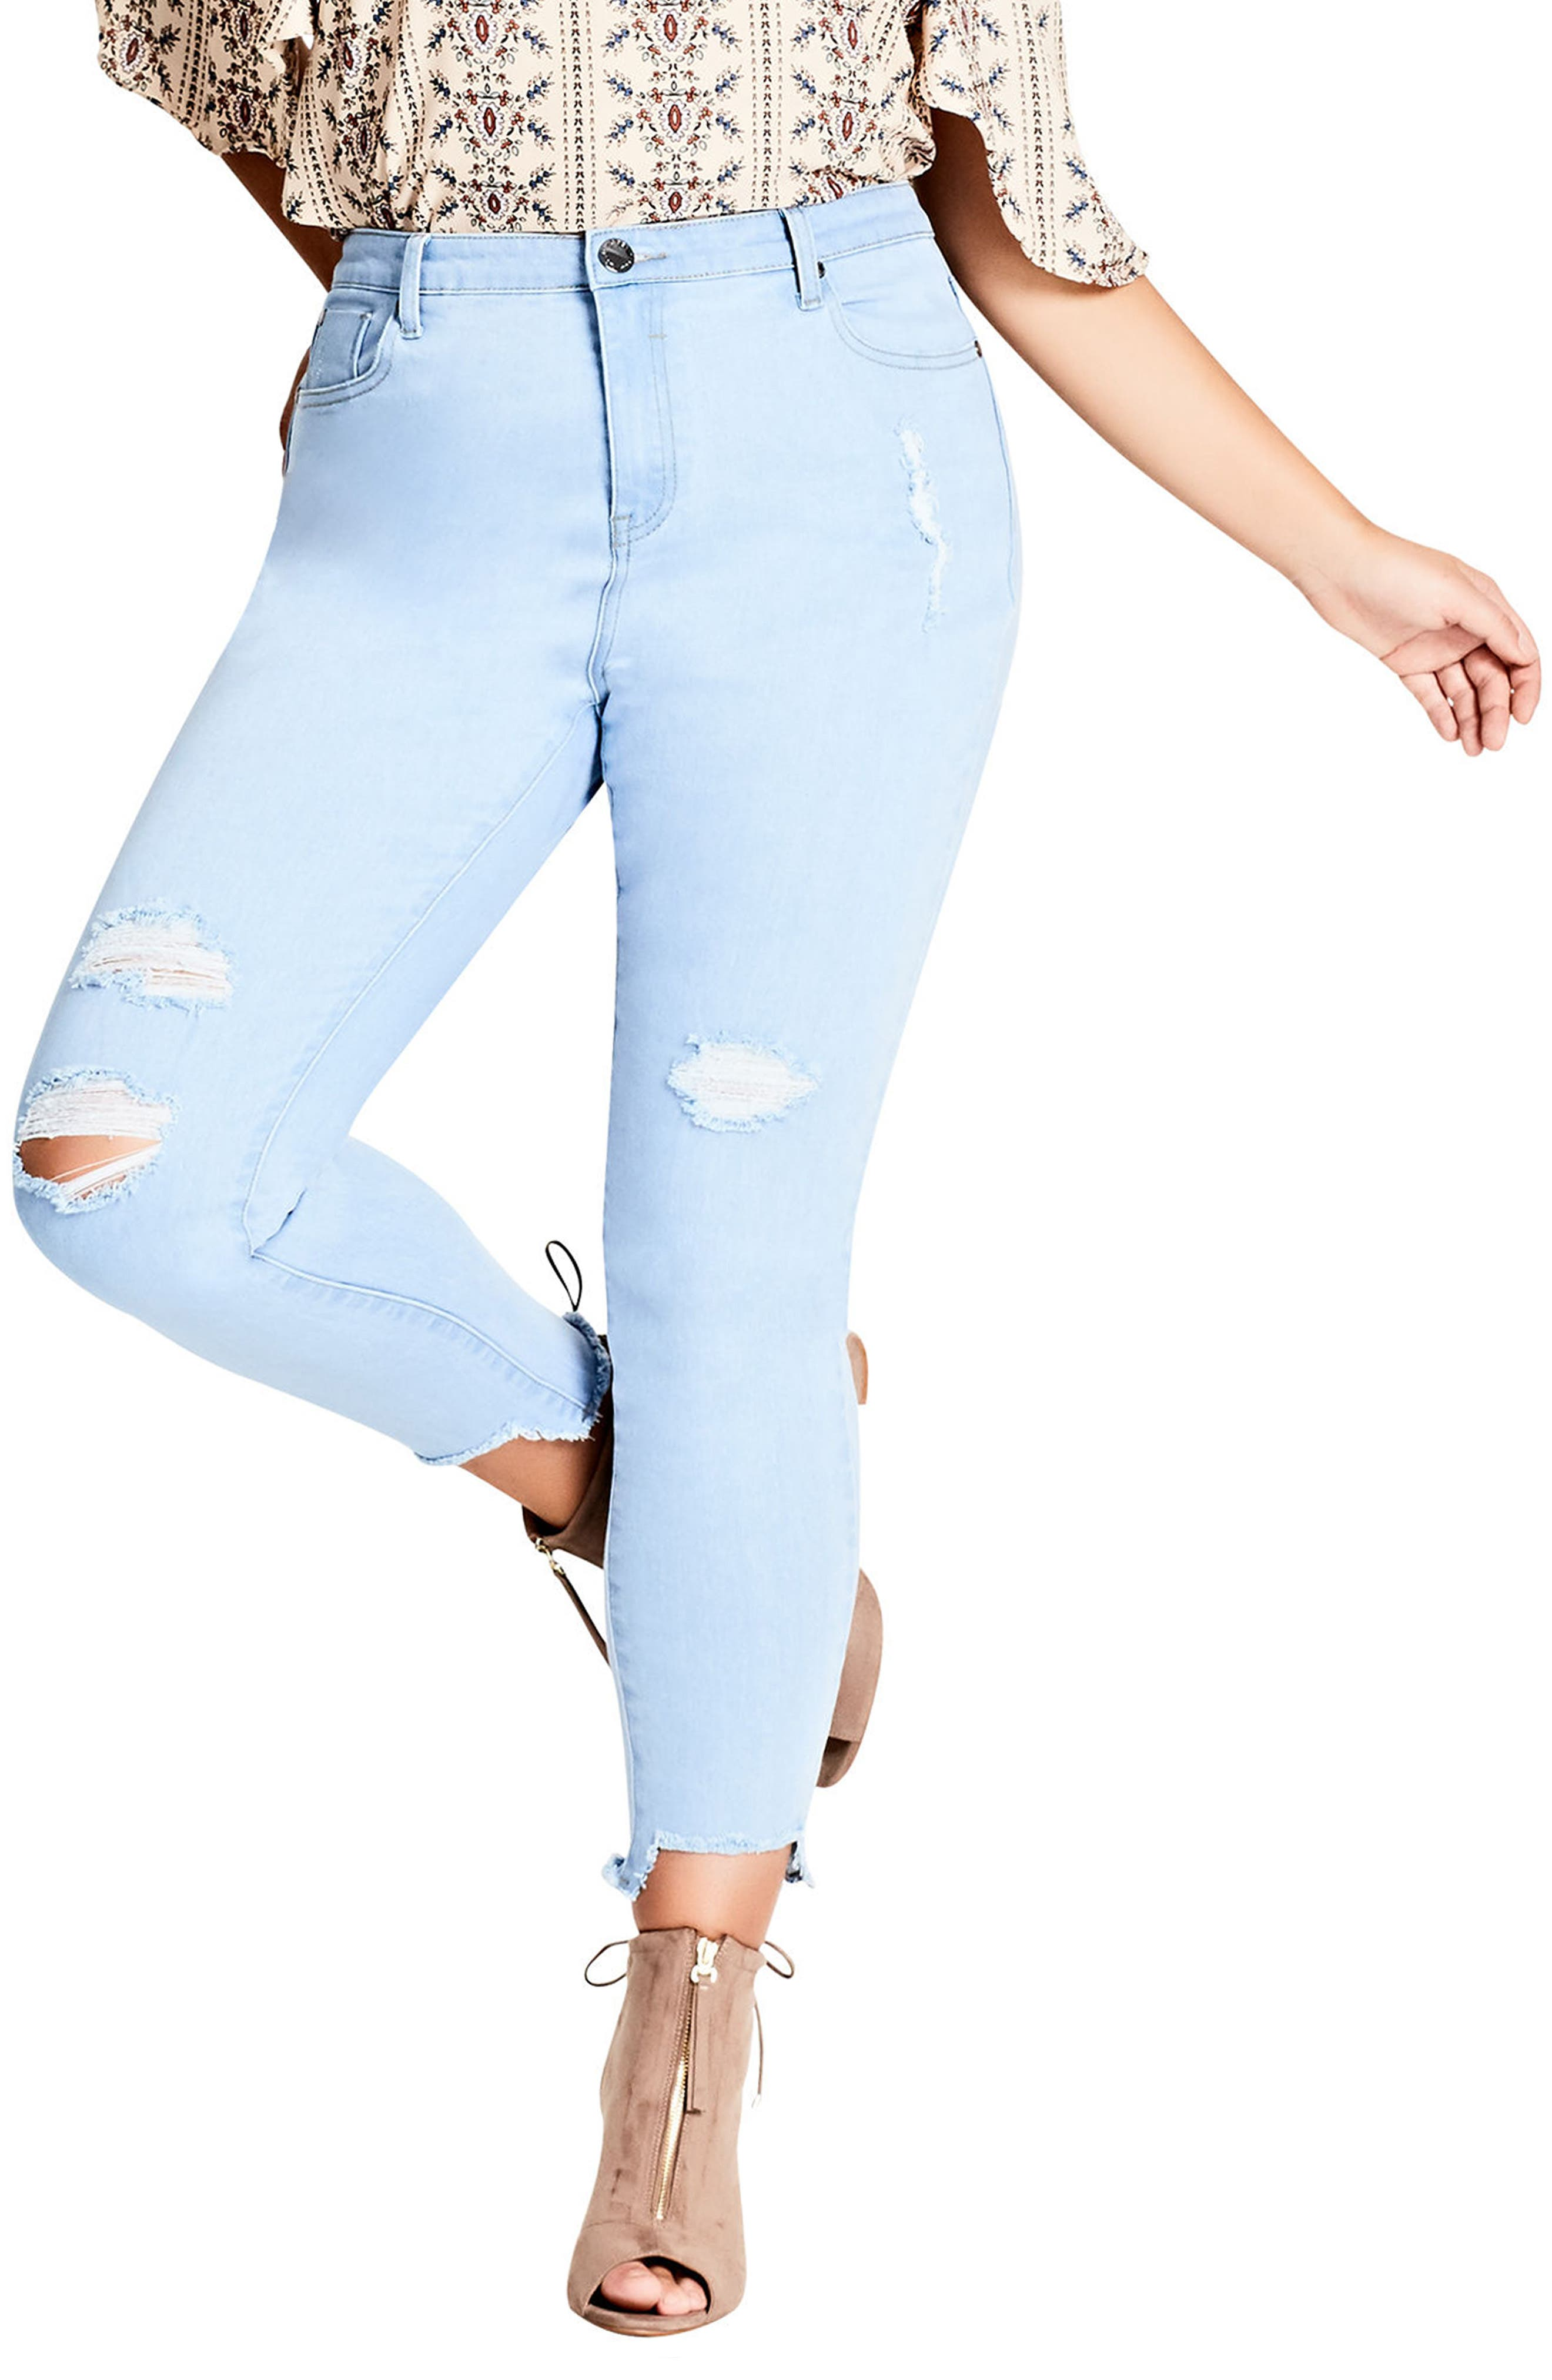 Ice Queen Crop Skinny Jeans,                         Main,                         color, 400